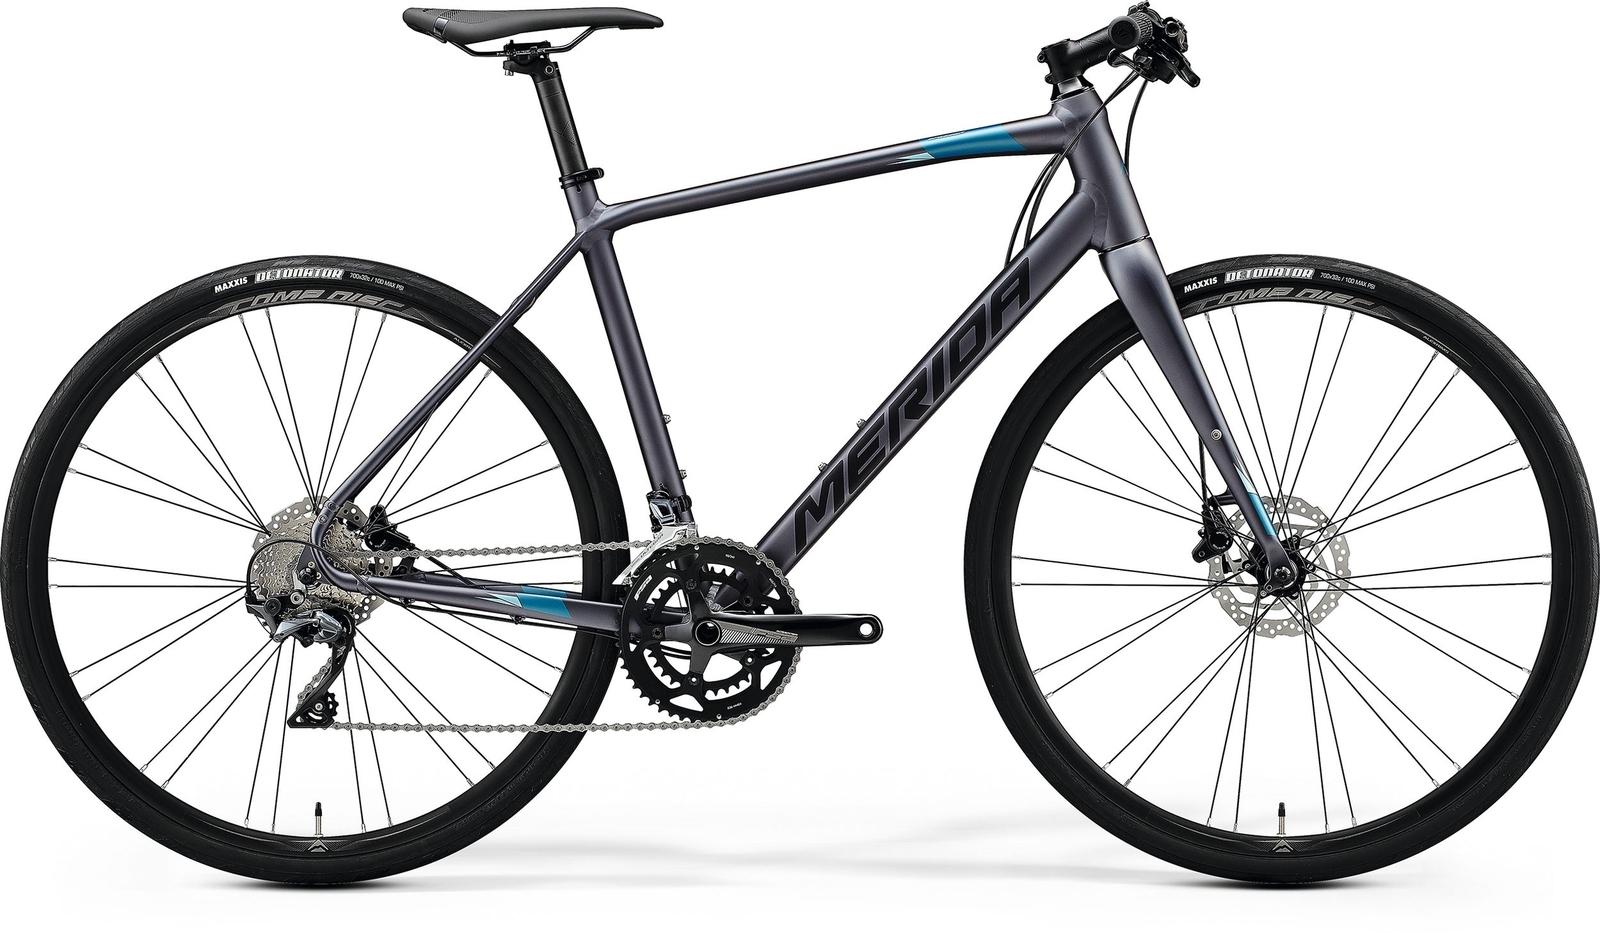 Bicicleta de sosea barbati Merida Speeder 500 Antracit/Negru 2020 imagine